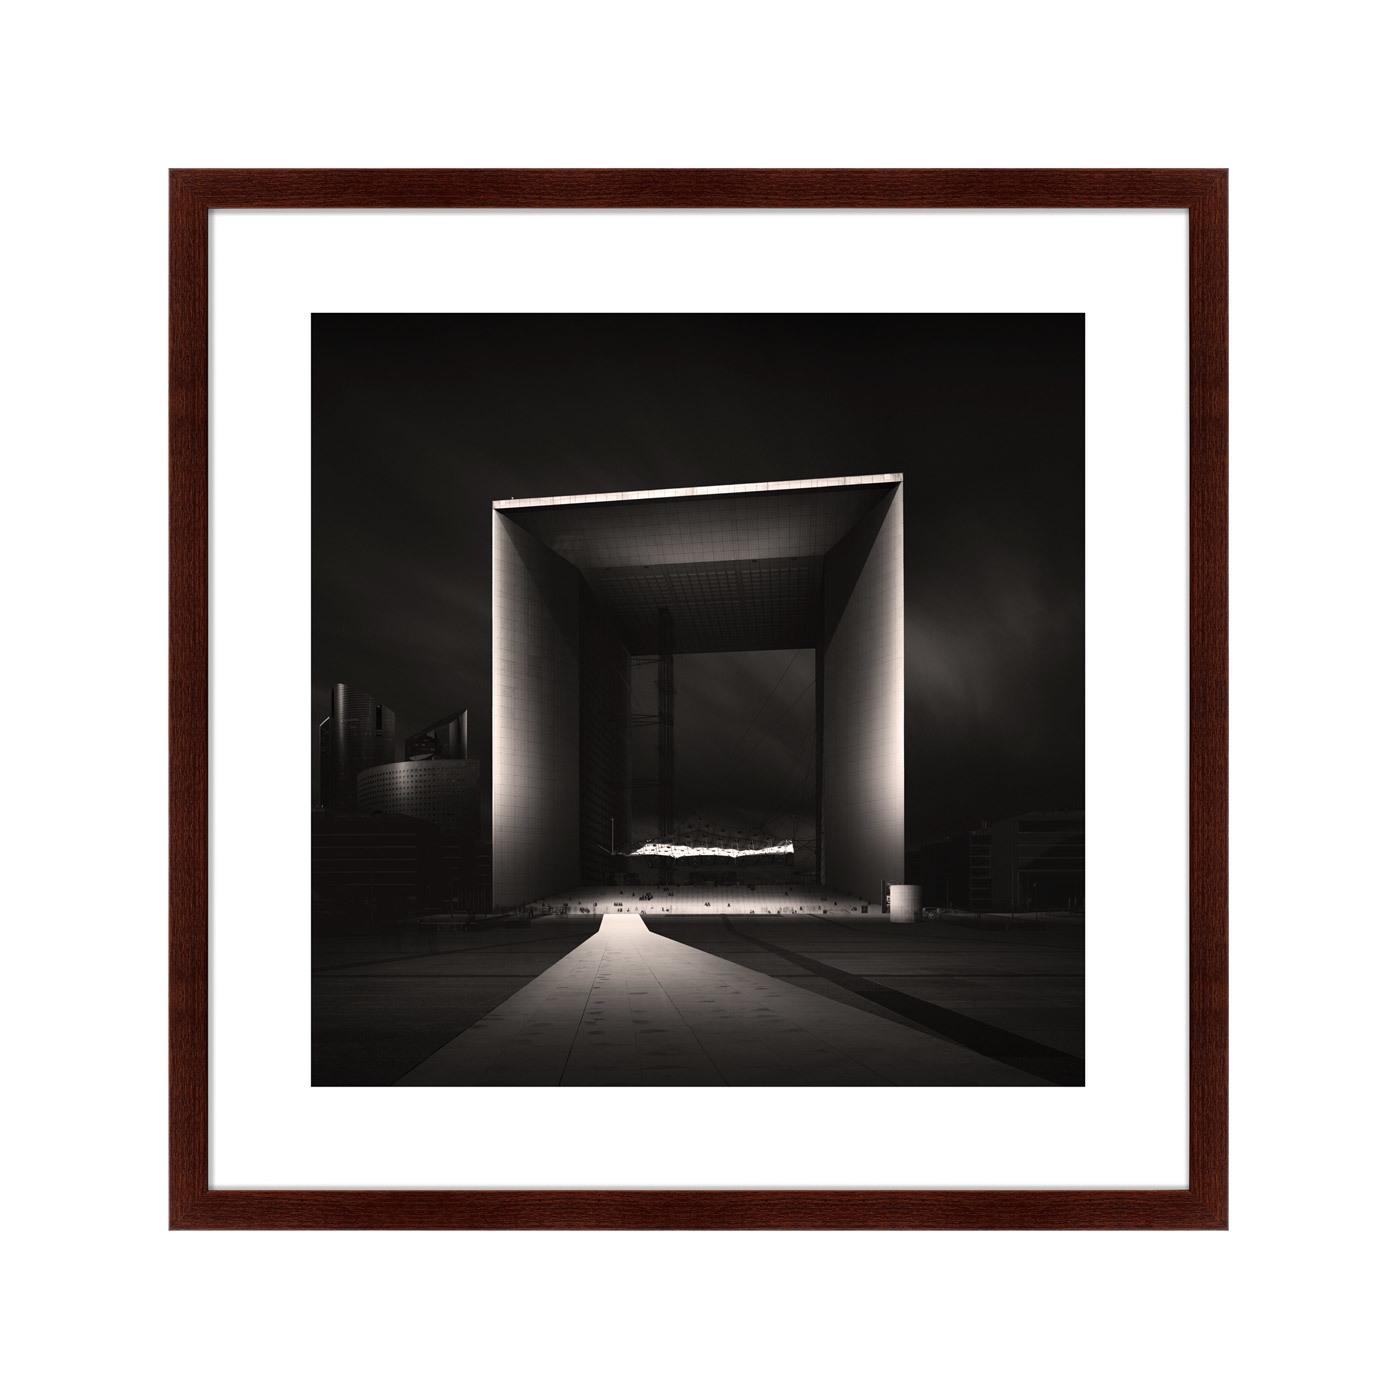 {} Картины в Квартиру Картина Black square №1 (79х79 см) куплю 1 квартиру в северном бутово